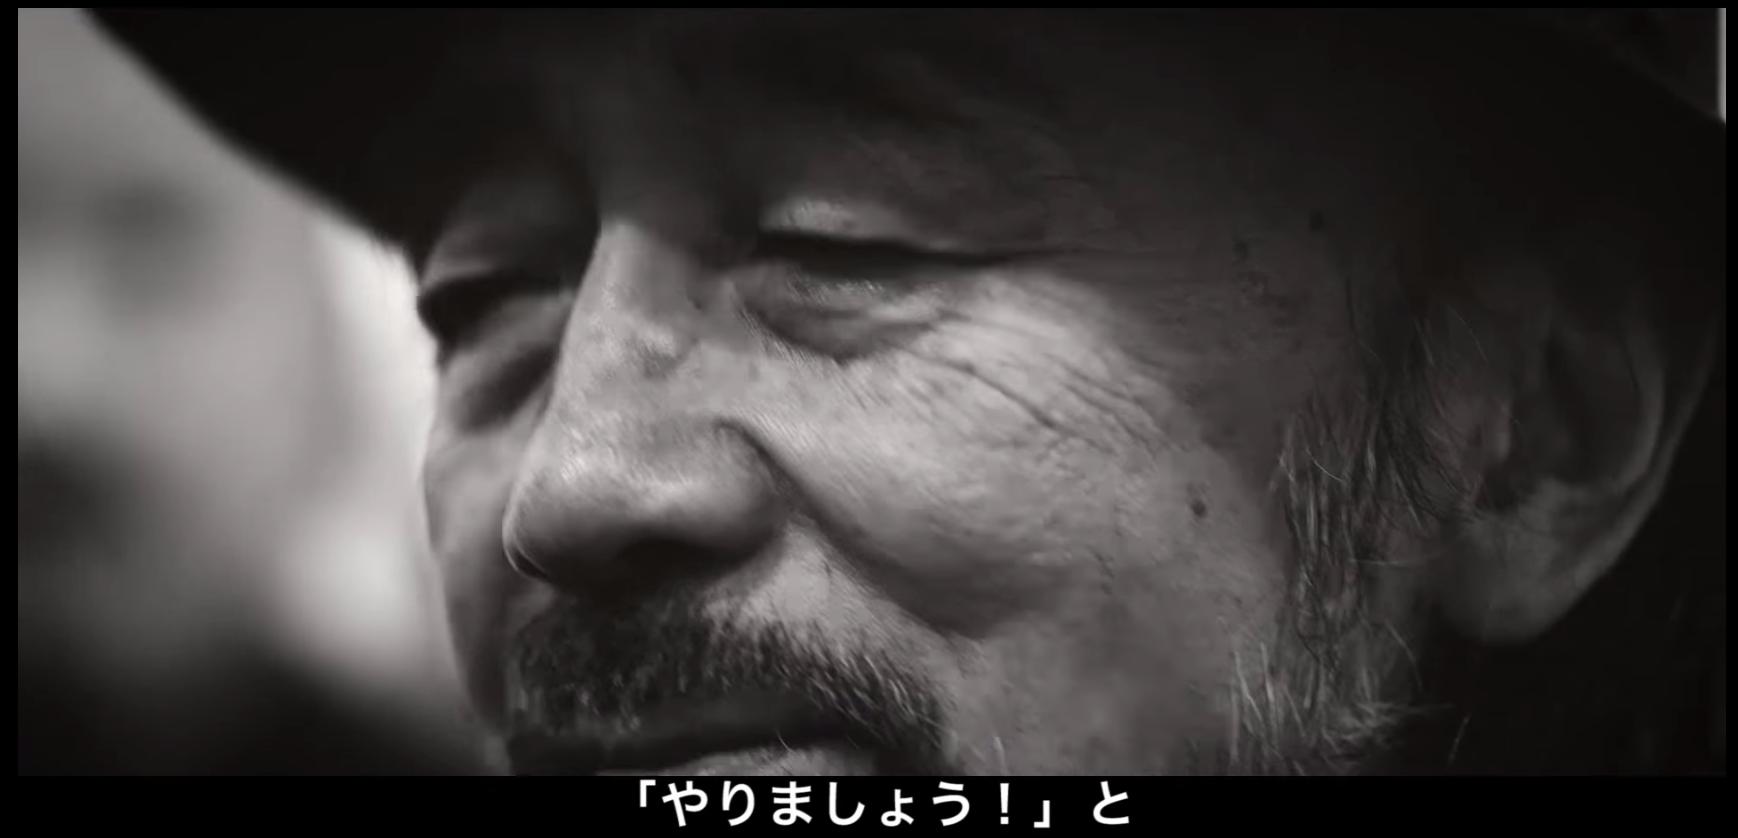 Yohji Yamamoto is the 'Master of the Shadows'